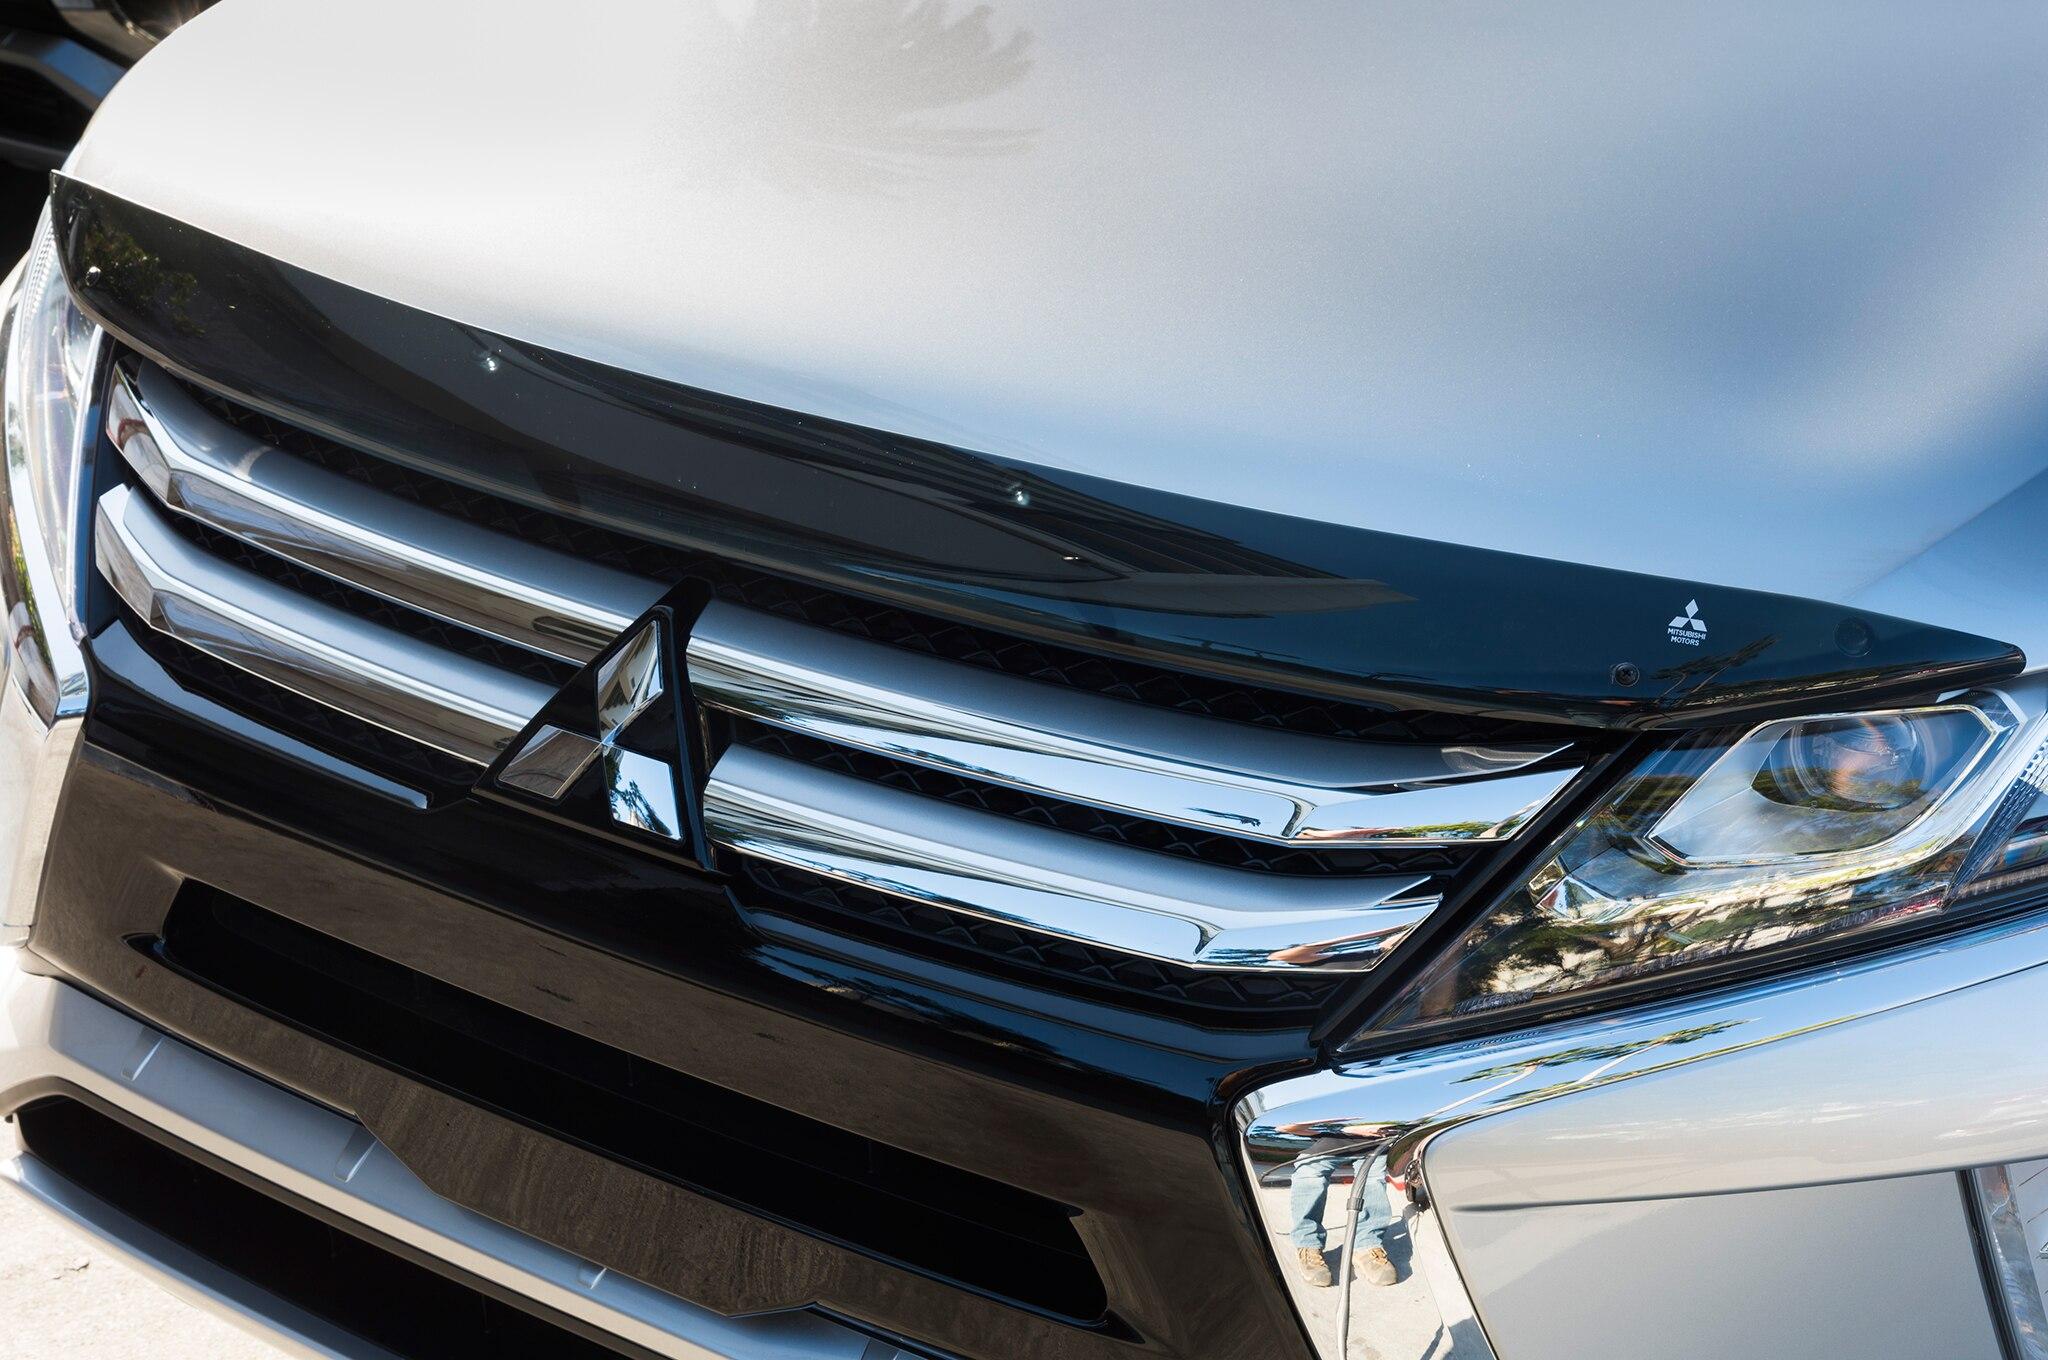 2018 Mitsubishi Eclipse Cross First Drive Review | Automobile Magazine